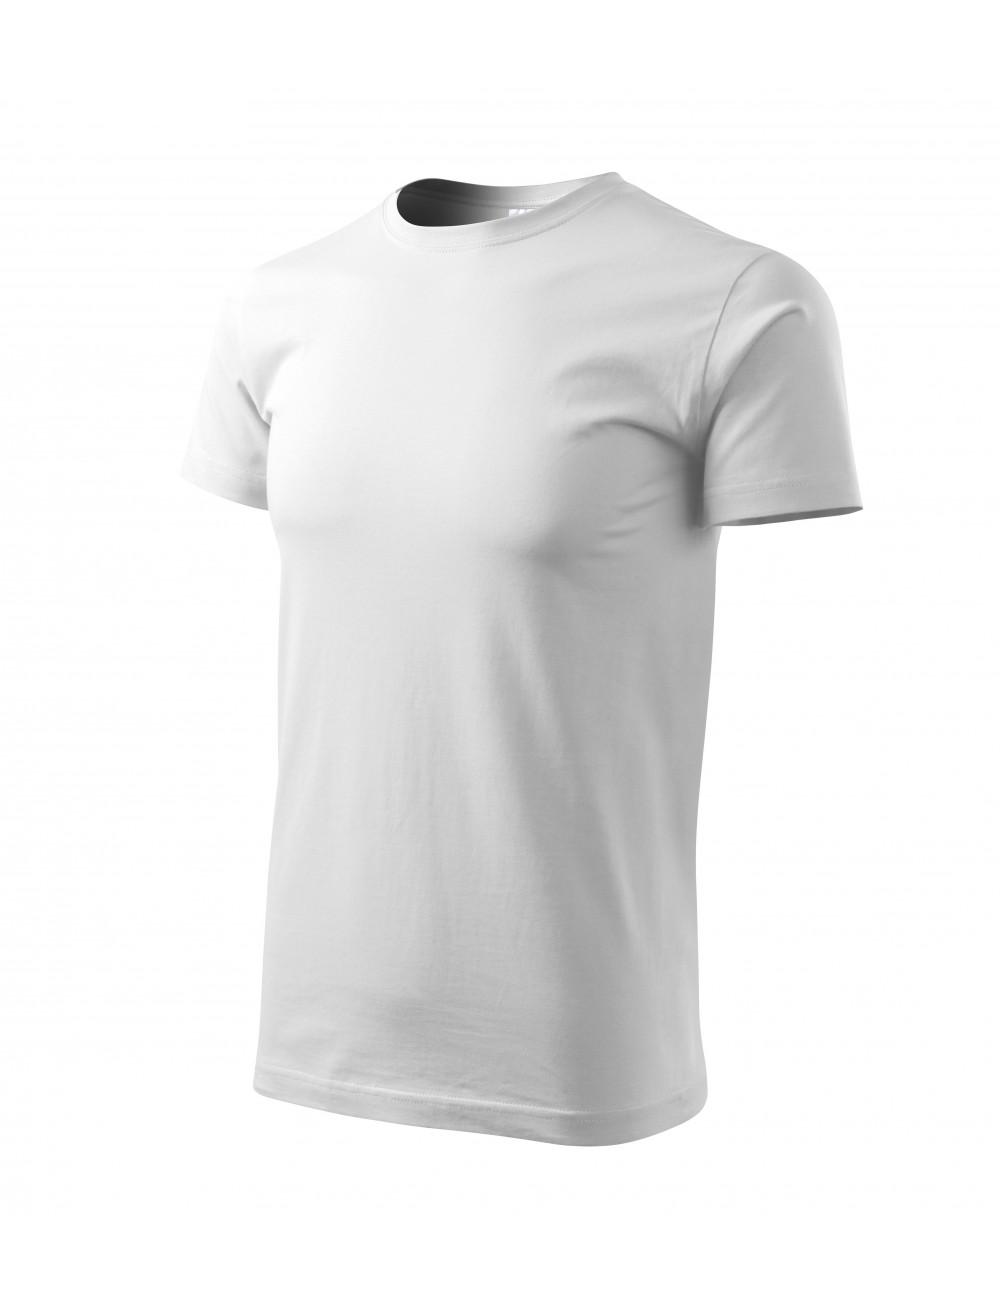 Adler MALFINI Koszulka unisex Heavy New 137 biały